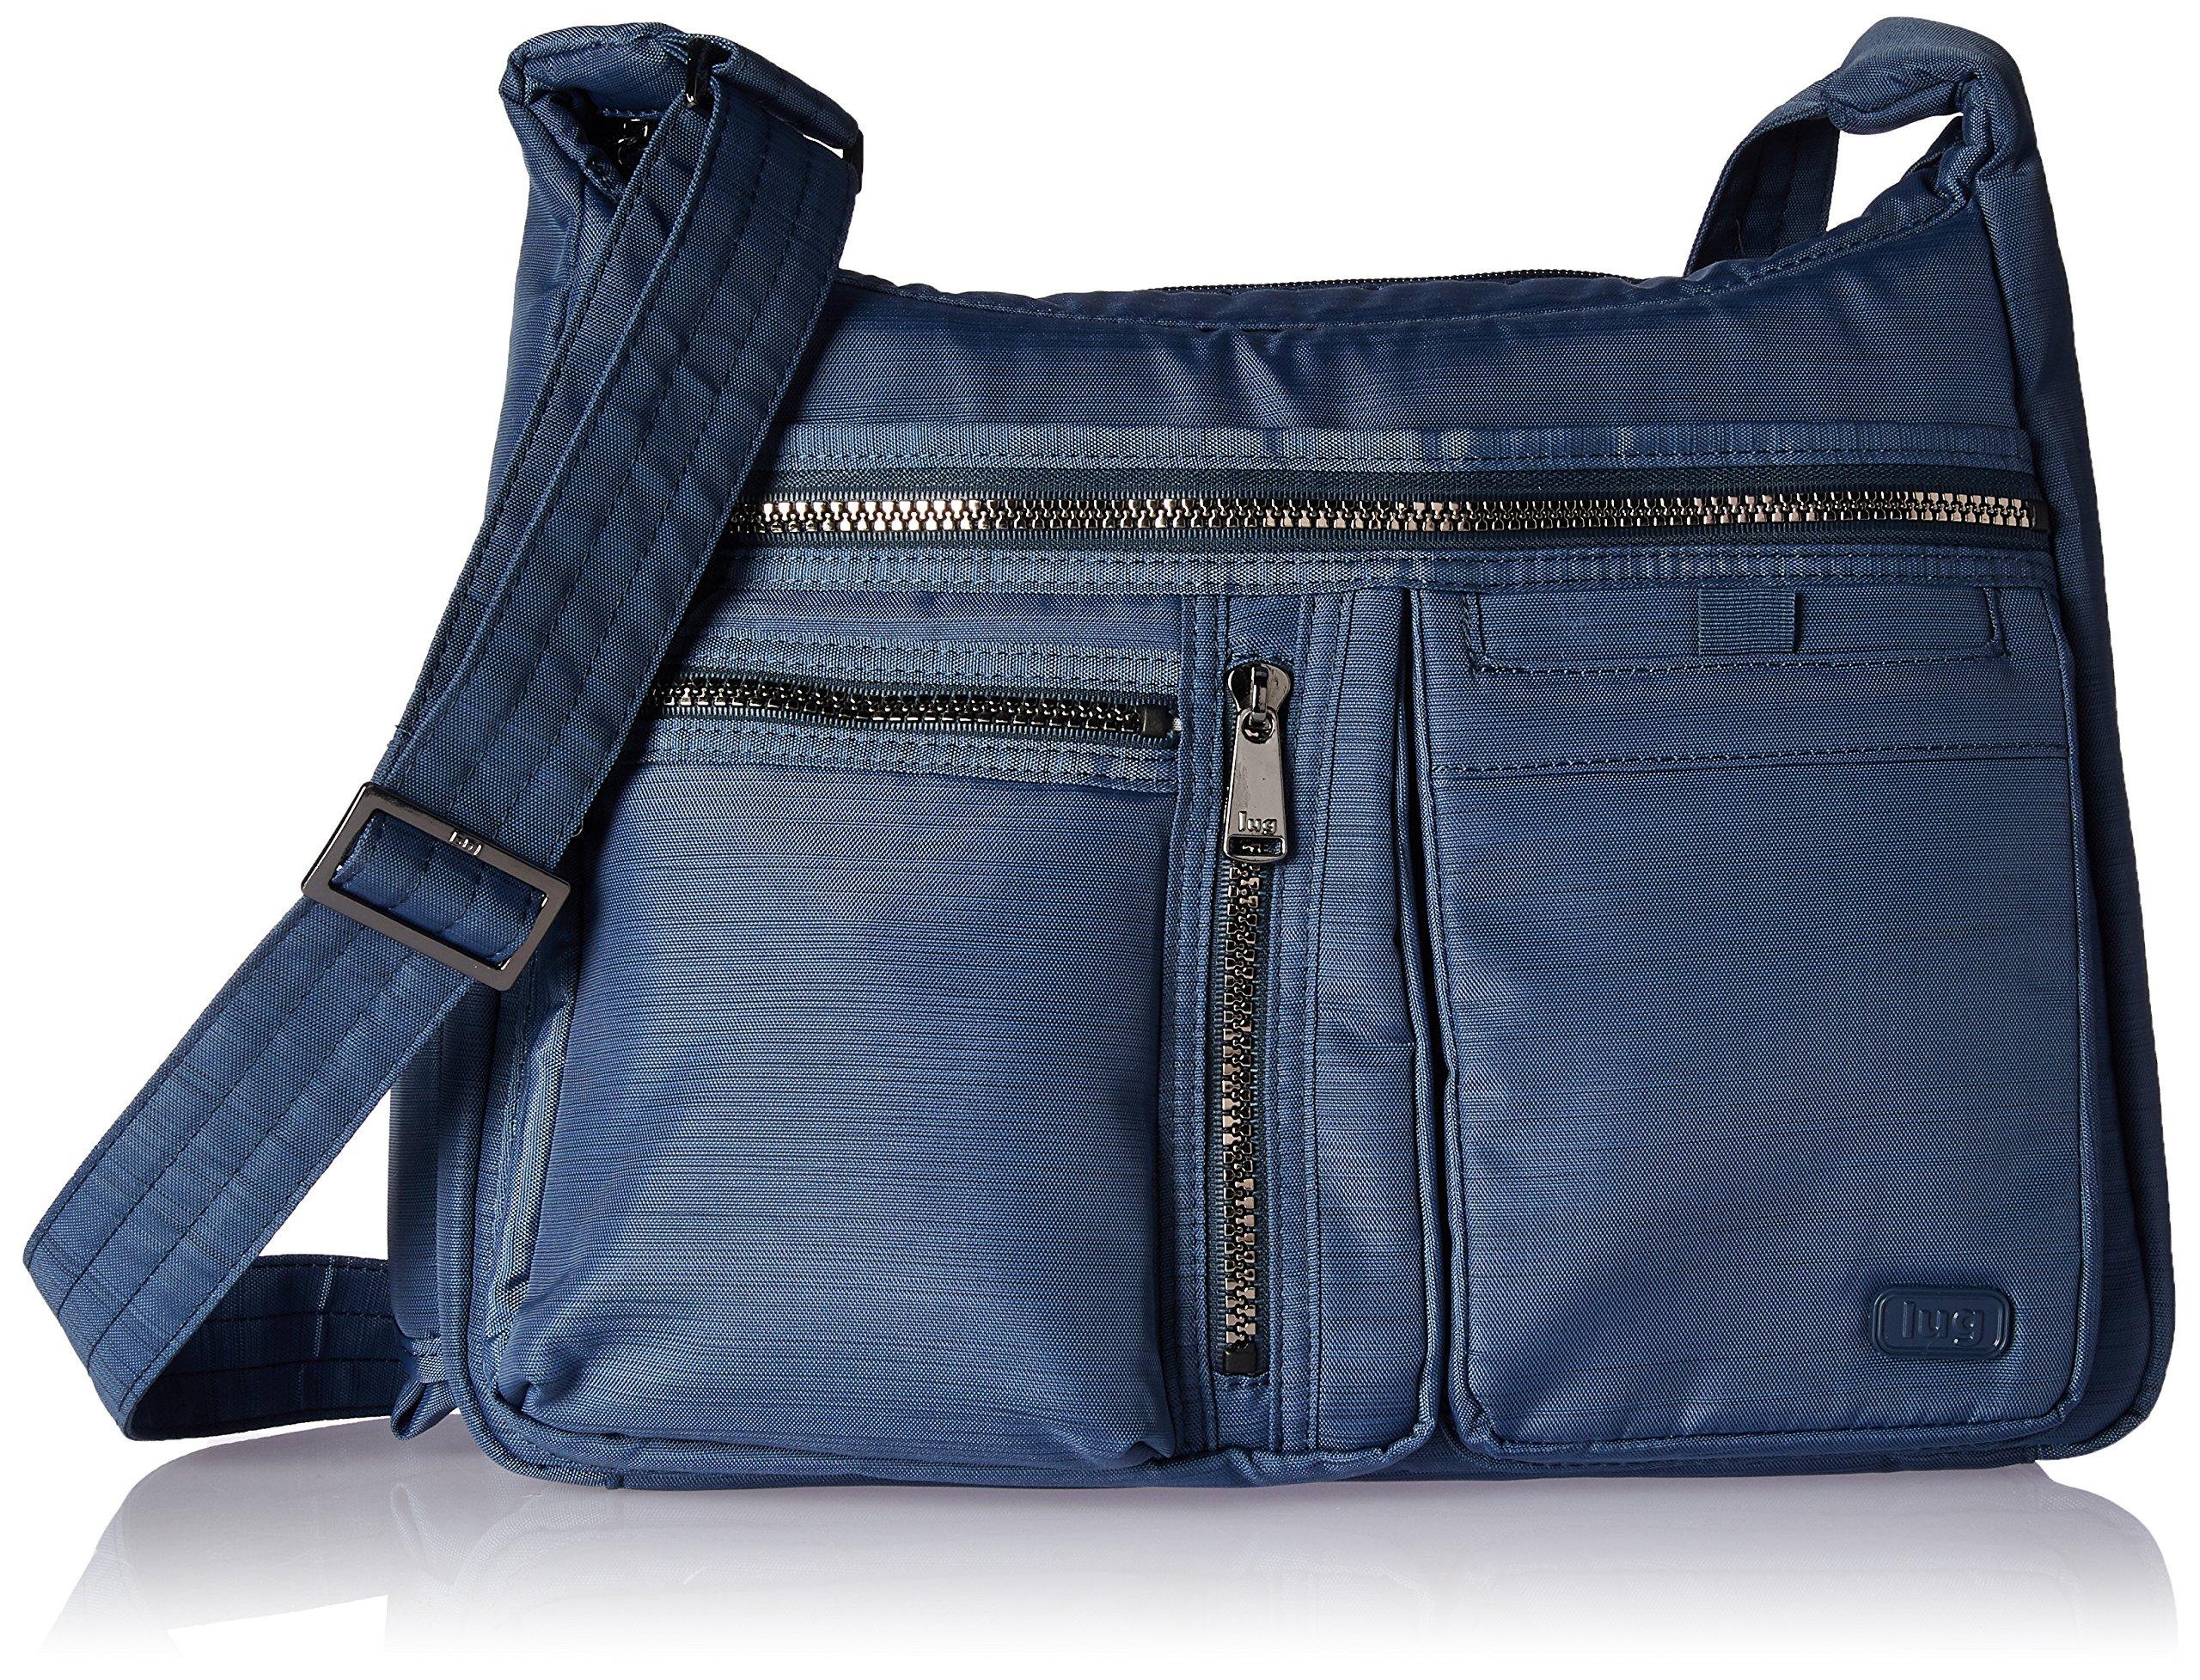 Lug Women's Double Dutch Cross Body Bag, Brushed Blue, One Size